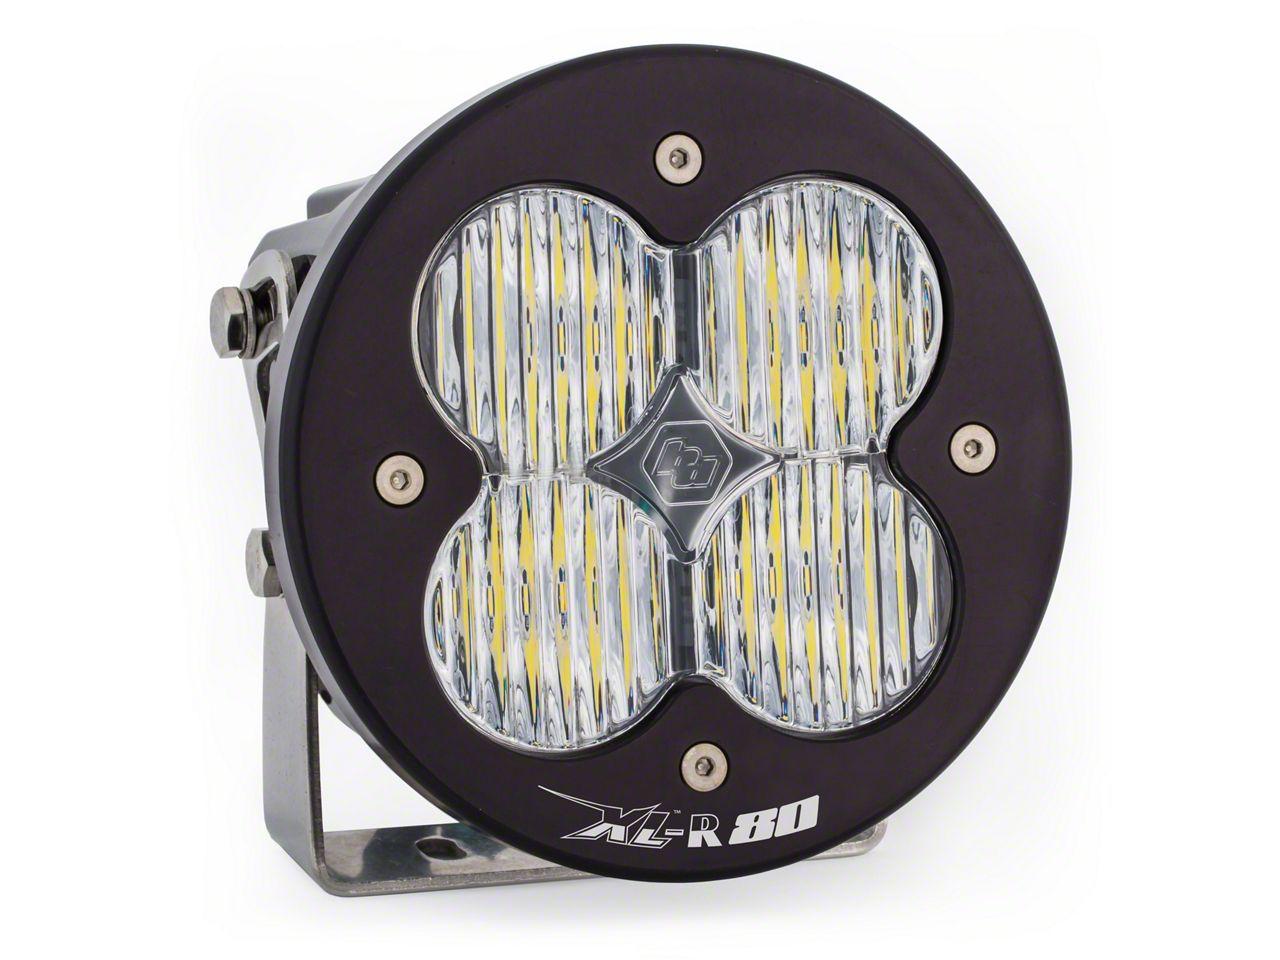 Baja Designs XL-R 80 LED Light - Wide Cornering Beam